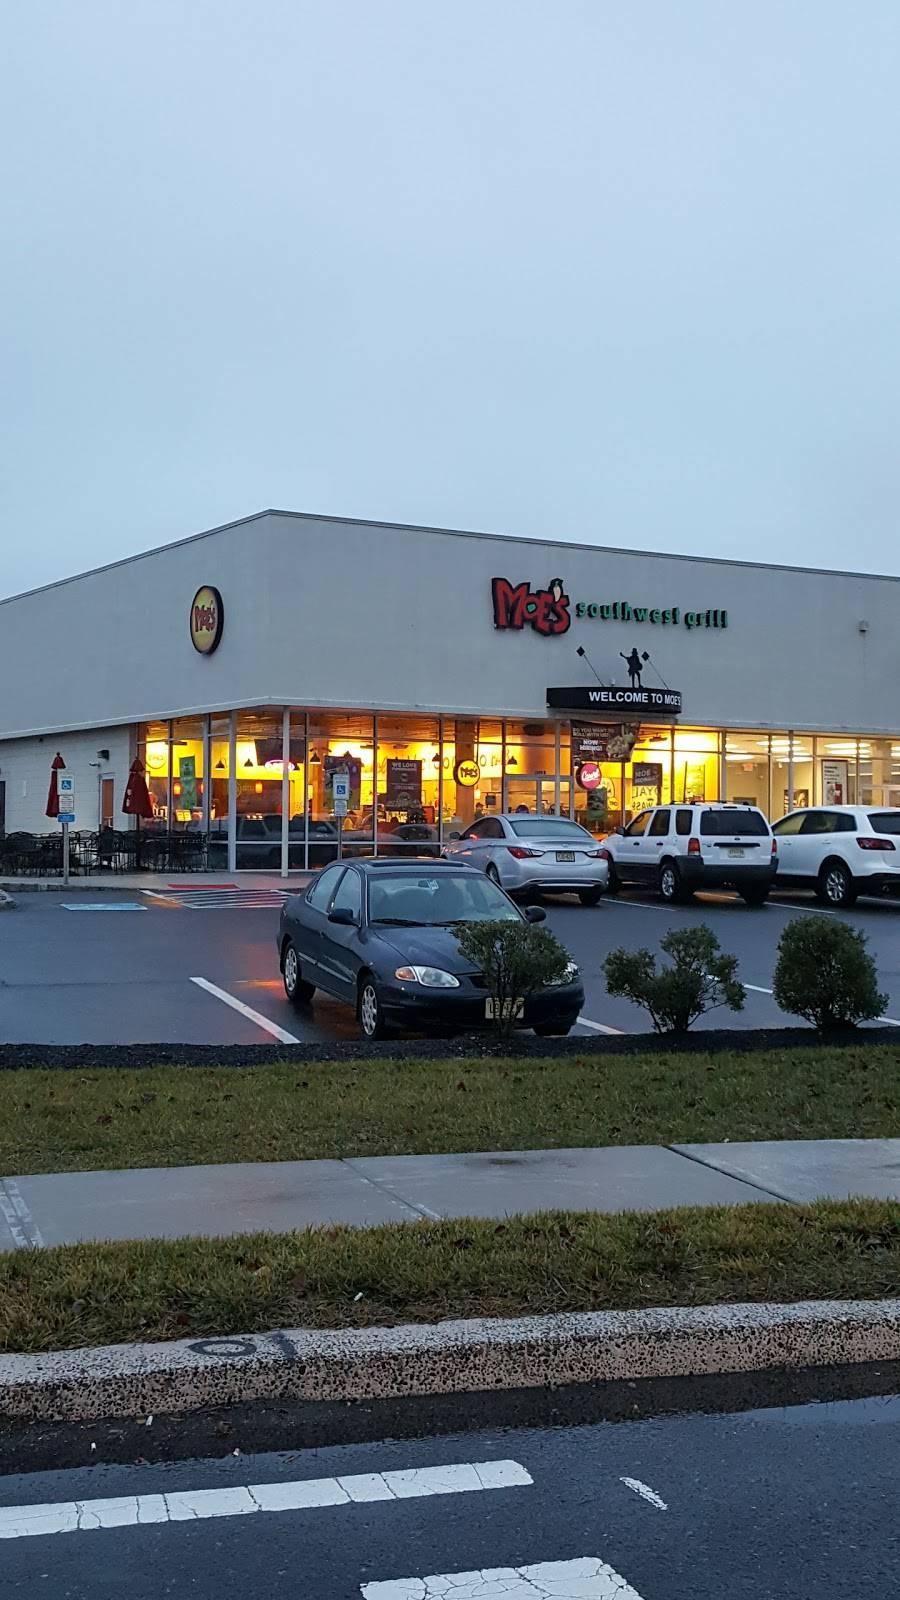 Moes Southwest Grill | restaurant | 1309 NJ-33, Hamilton Township, NJ 08690, USA | 6095849600 OR +1 609-584-9600